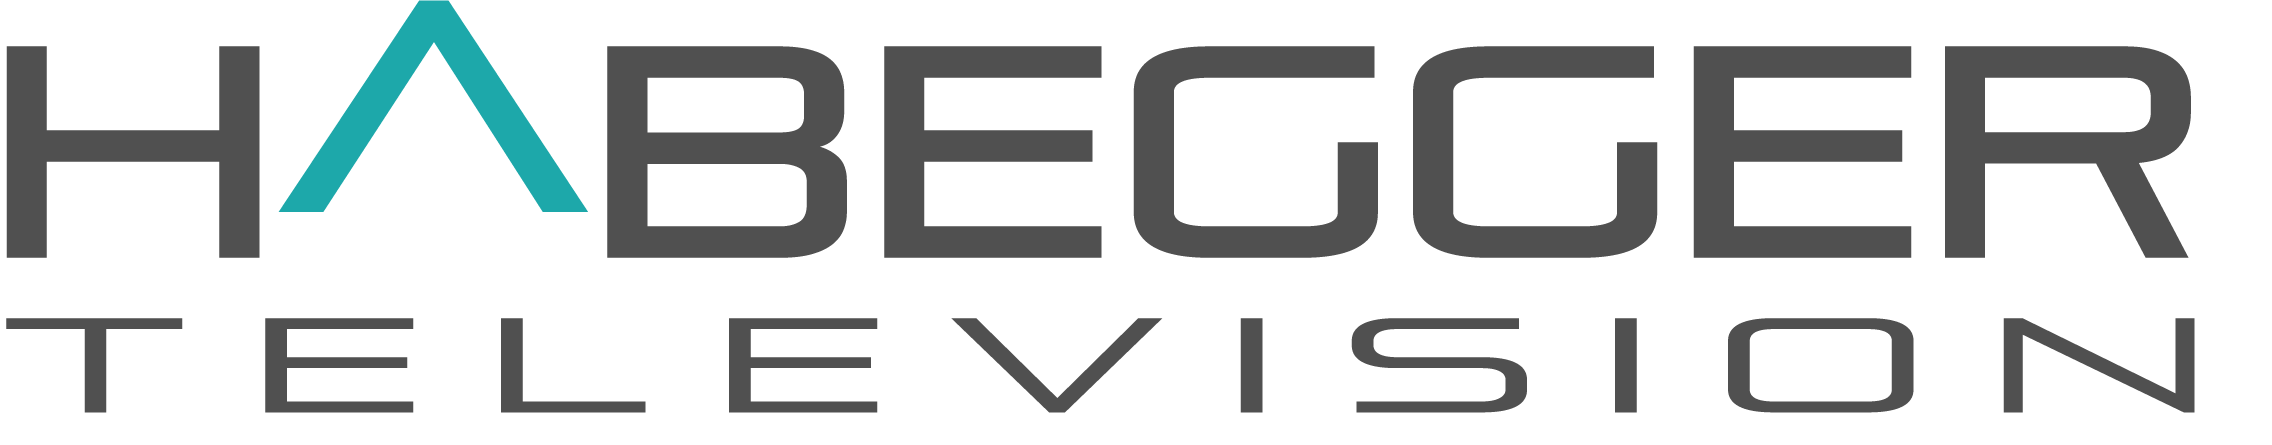 Habegger TELEVISION